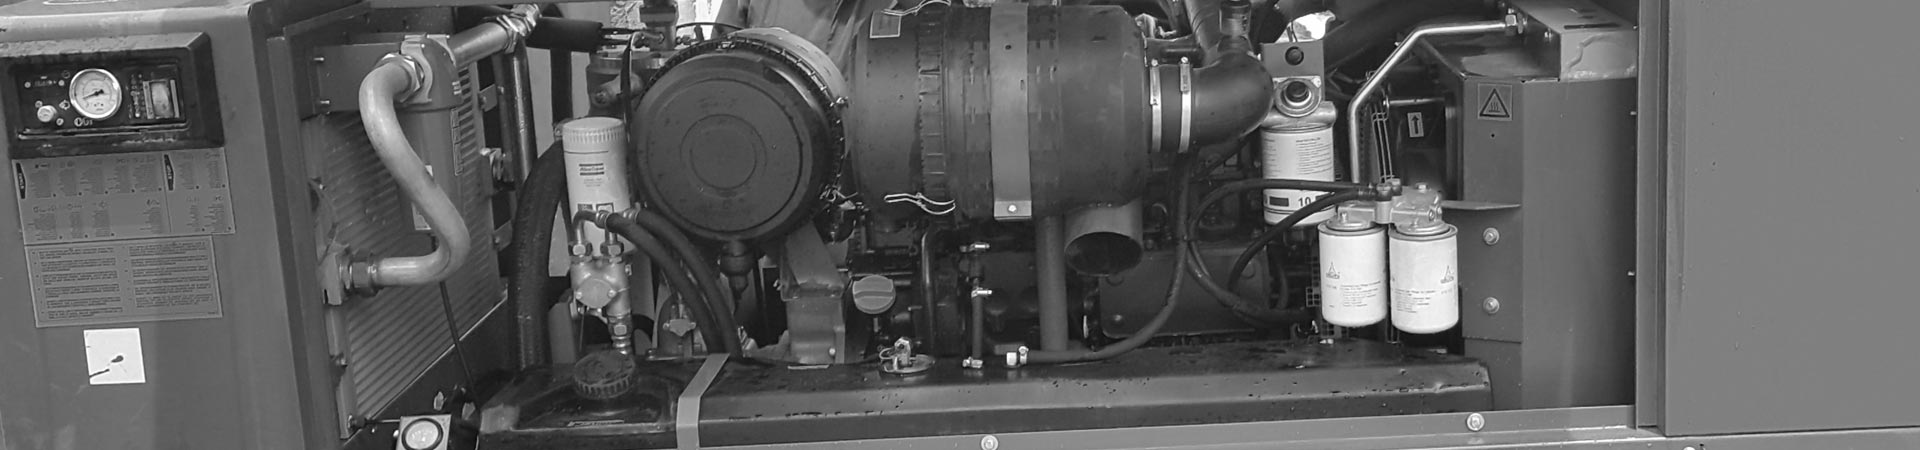 fondo-compresores-generadores